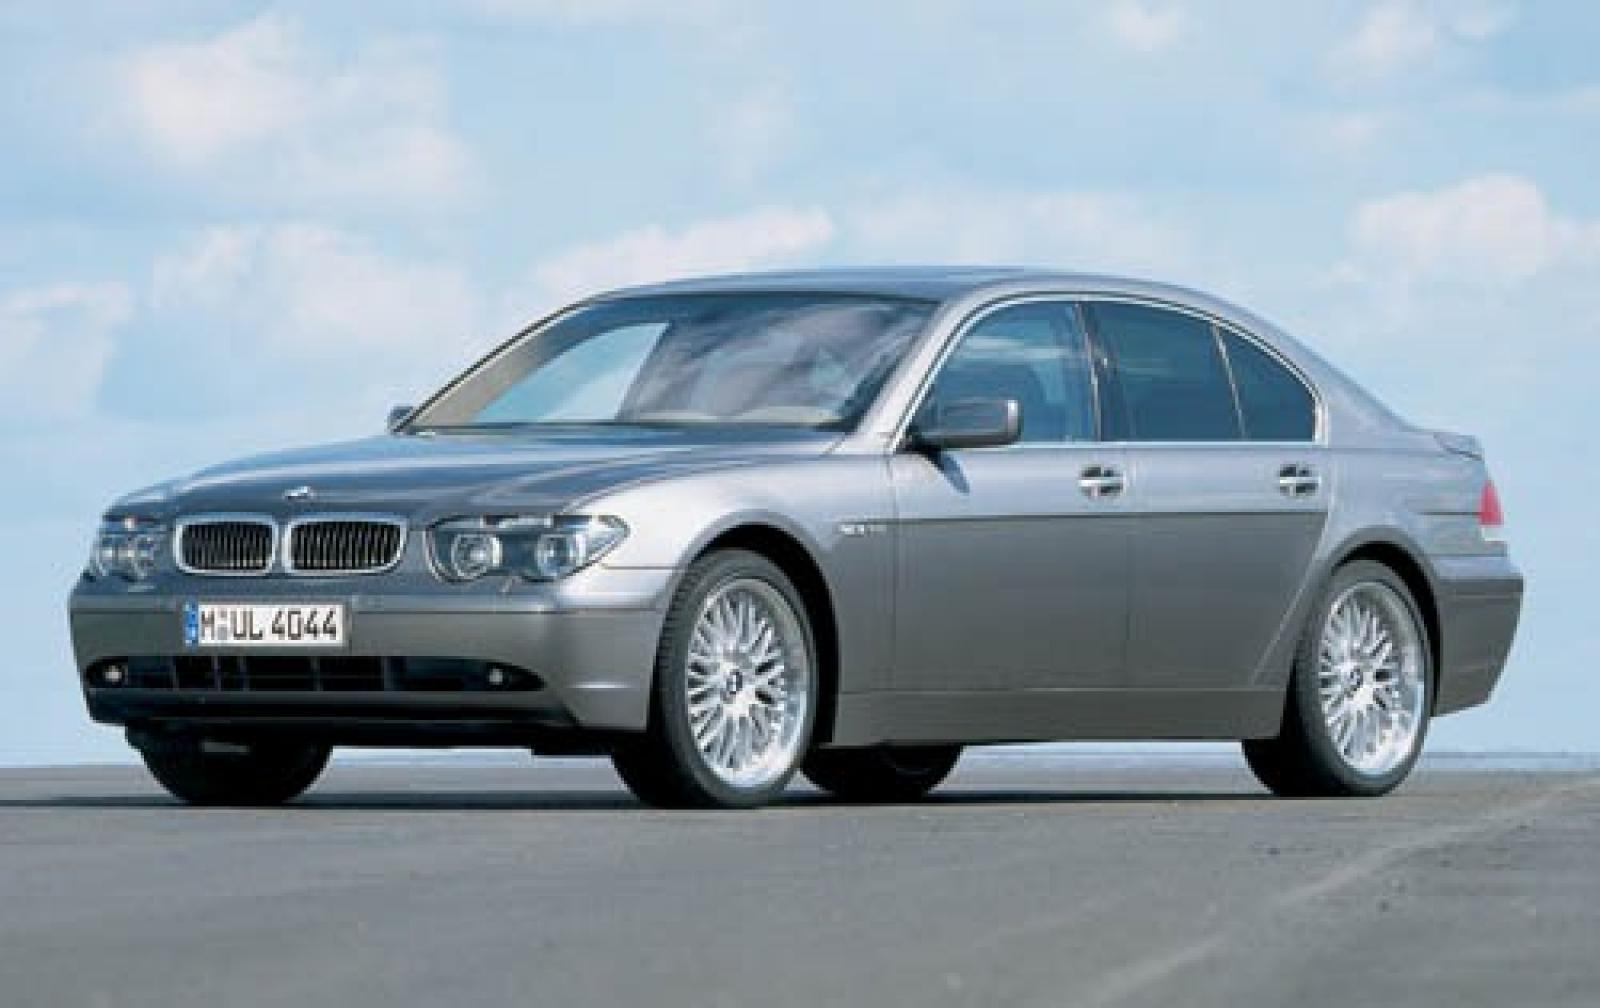 BMW 7 Series 745i En Interior 4 800 1024 1280 1600 Origin 2005